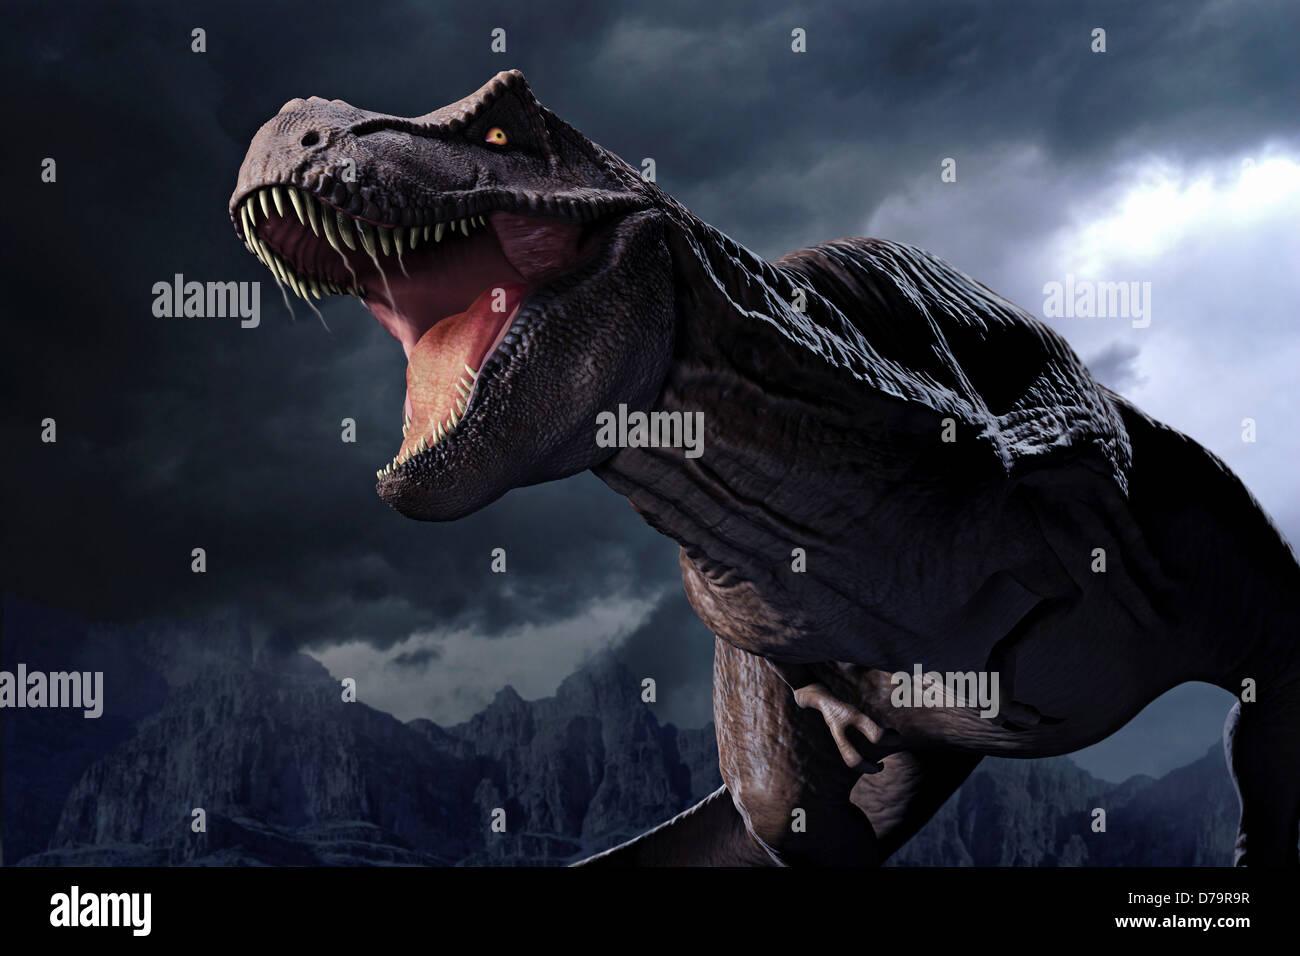 Dinosaur Tyrannosaurus) - Stock Image